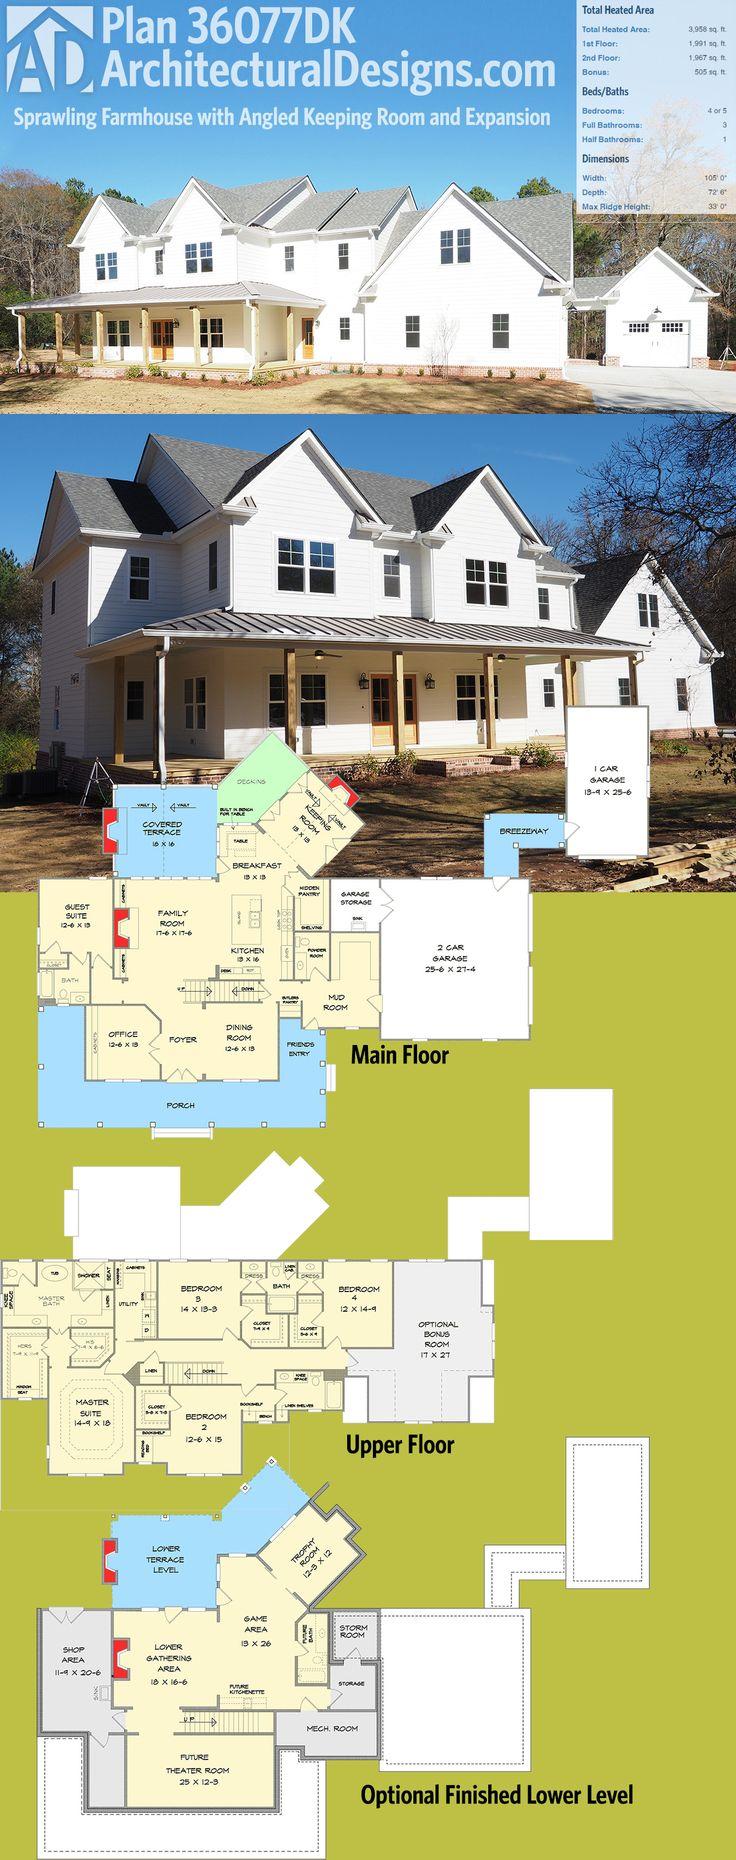 Stupendous 17 Best Ideas About House Plans On Pinterest Country House Plans Largest Home Design Picture Inspirations Pitcheantrous